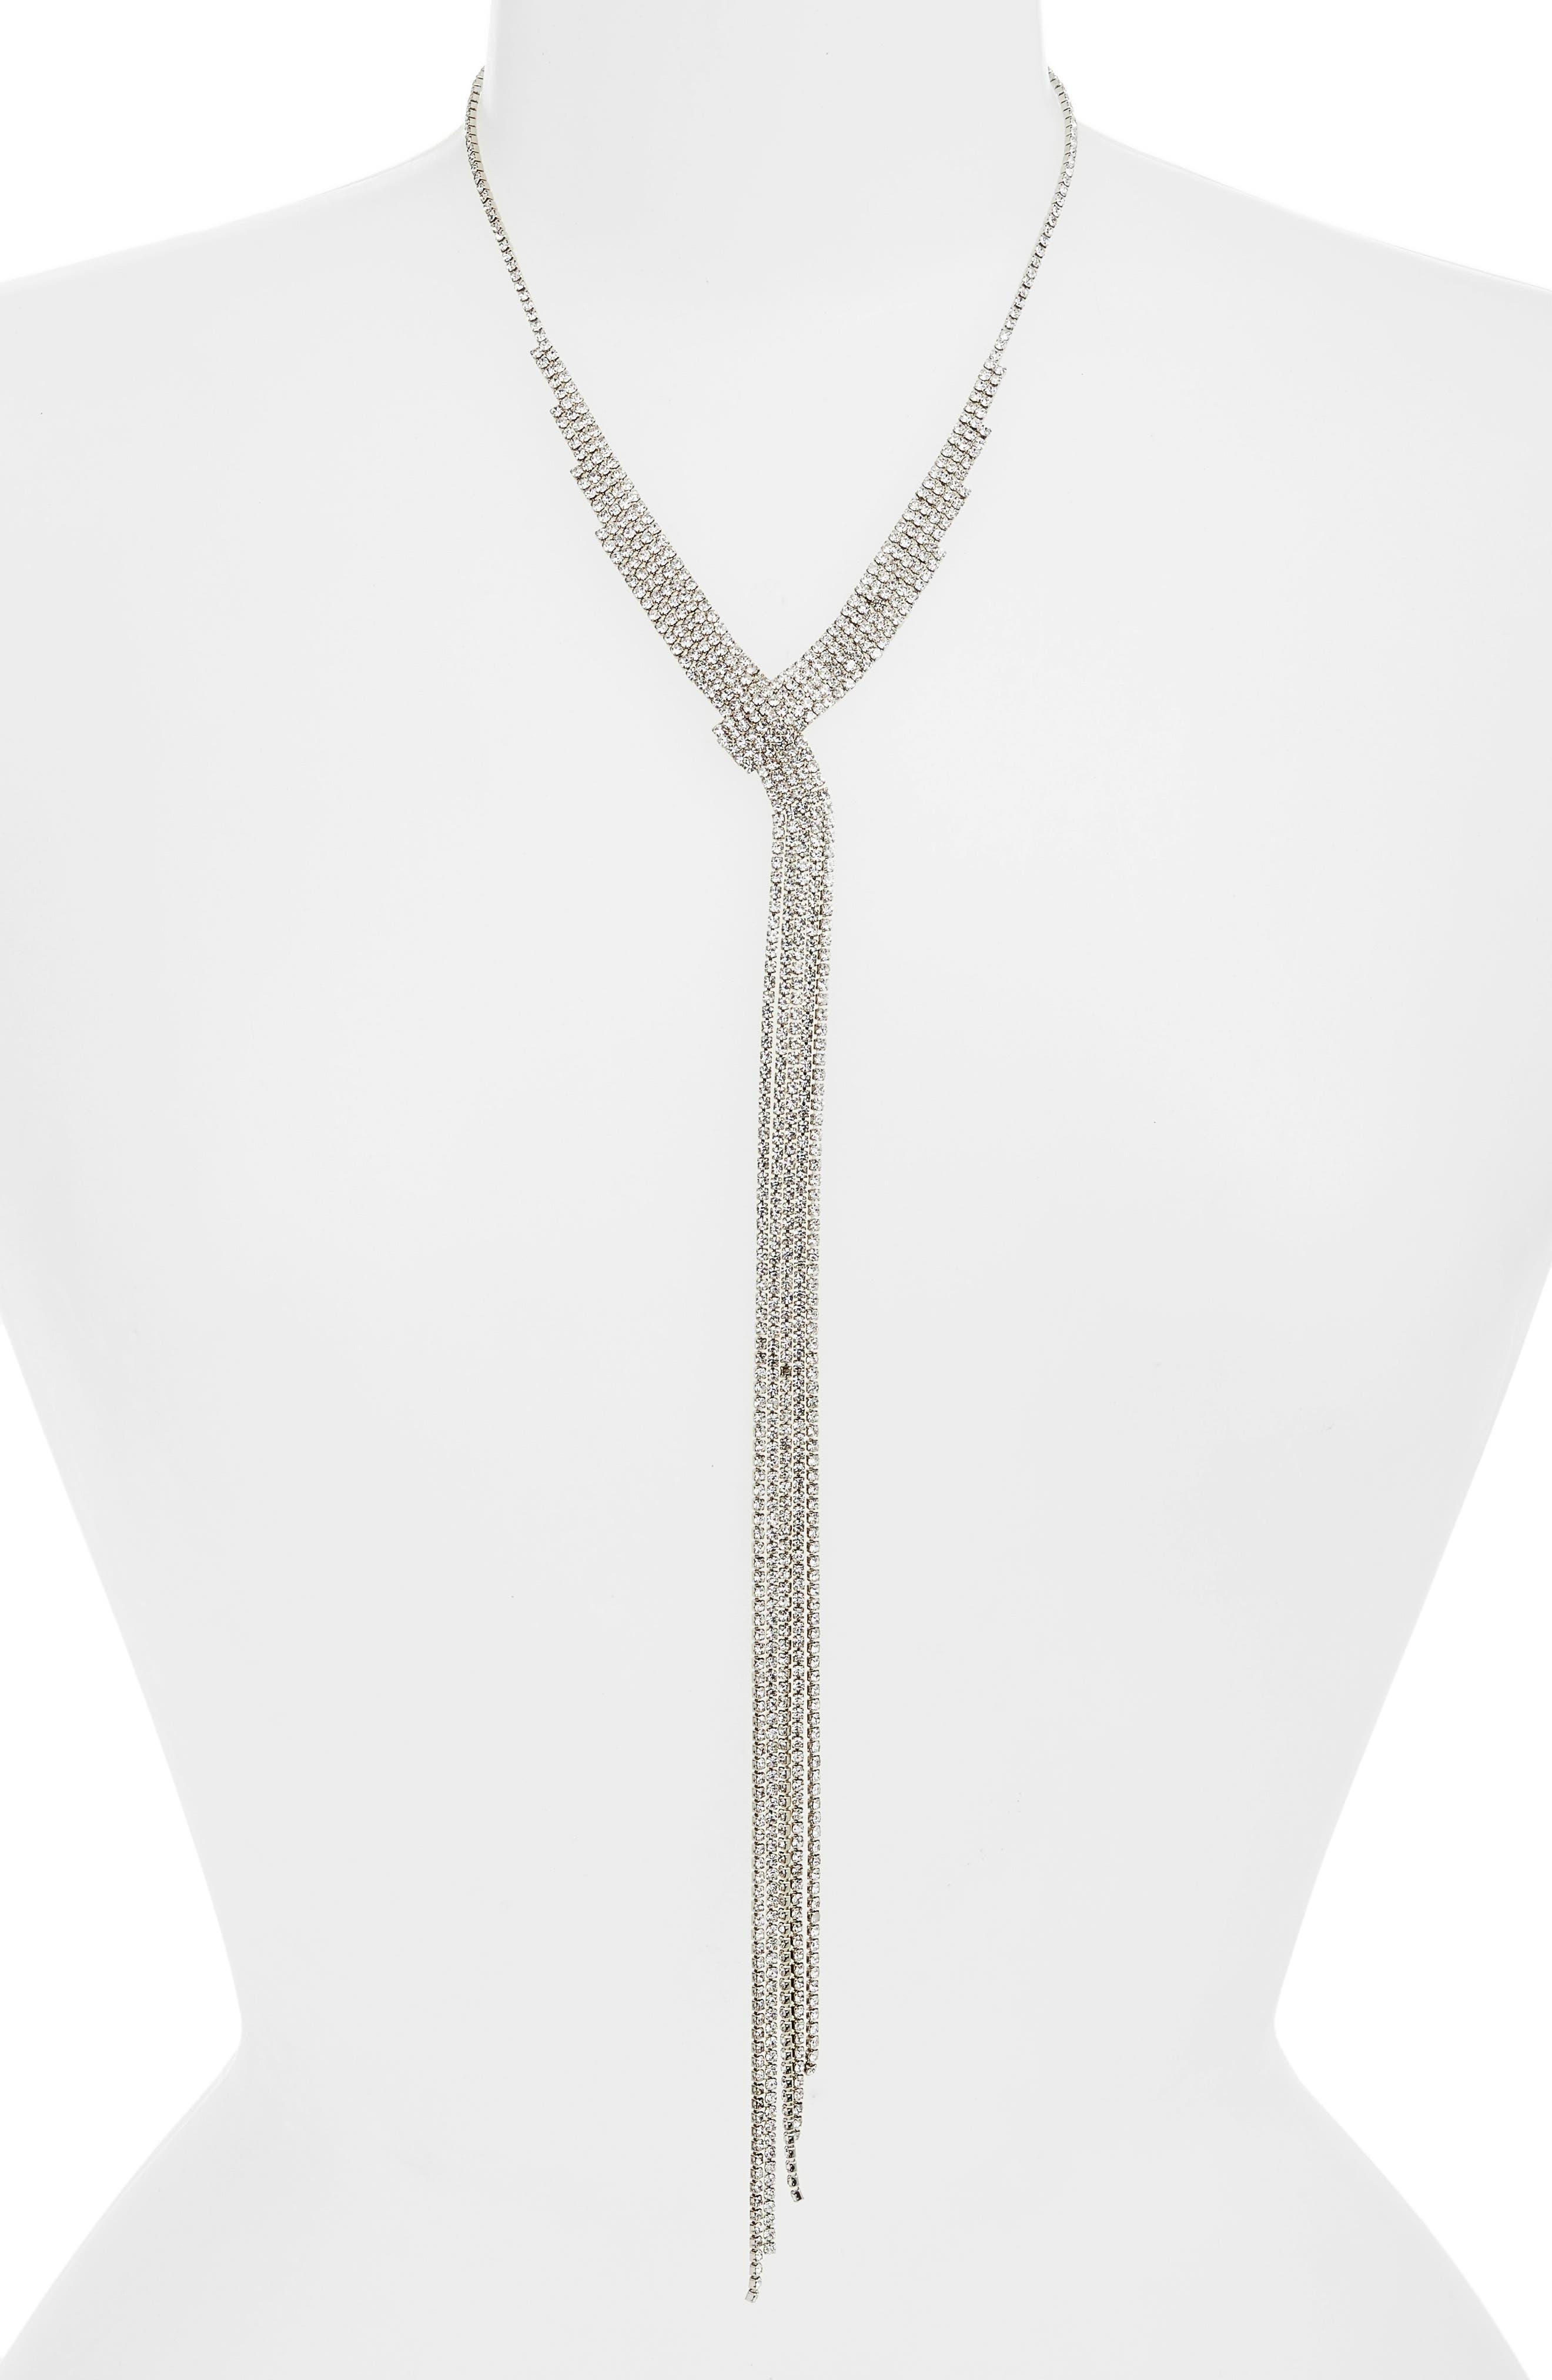 AREA STARS Irene Crystal Fringe Y-Necklace in Black